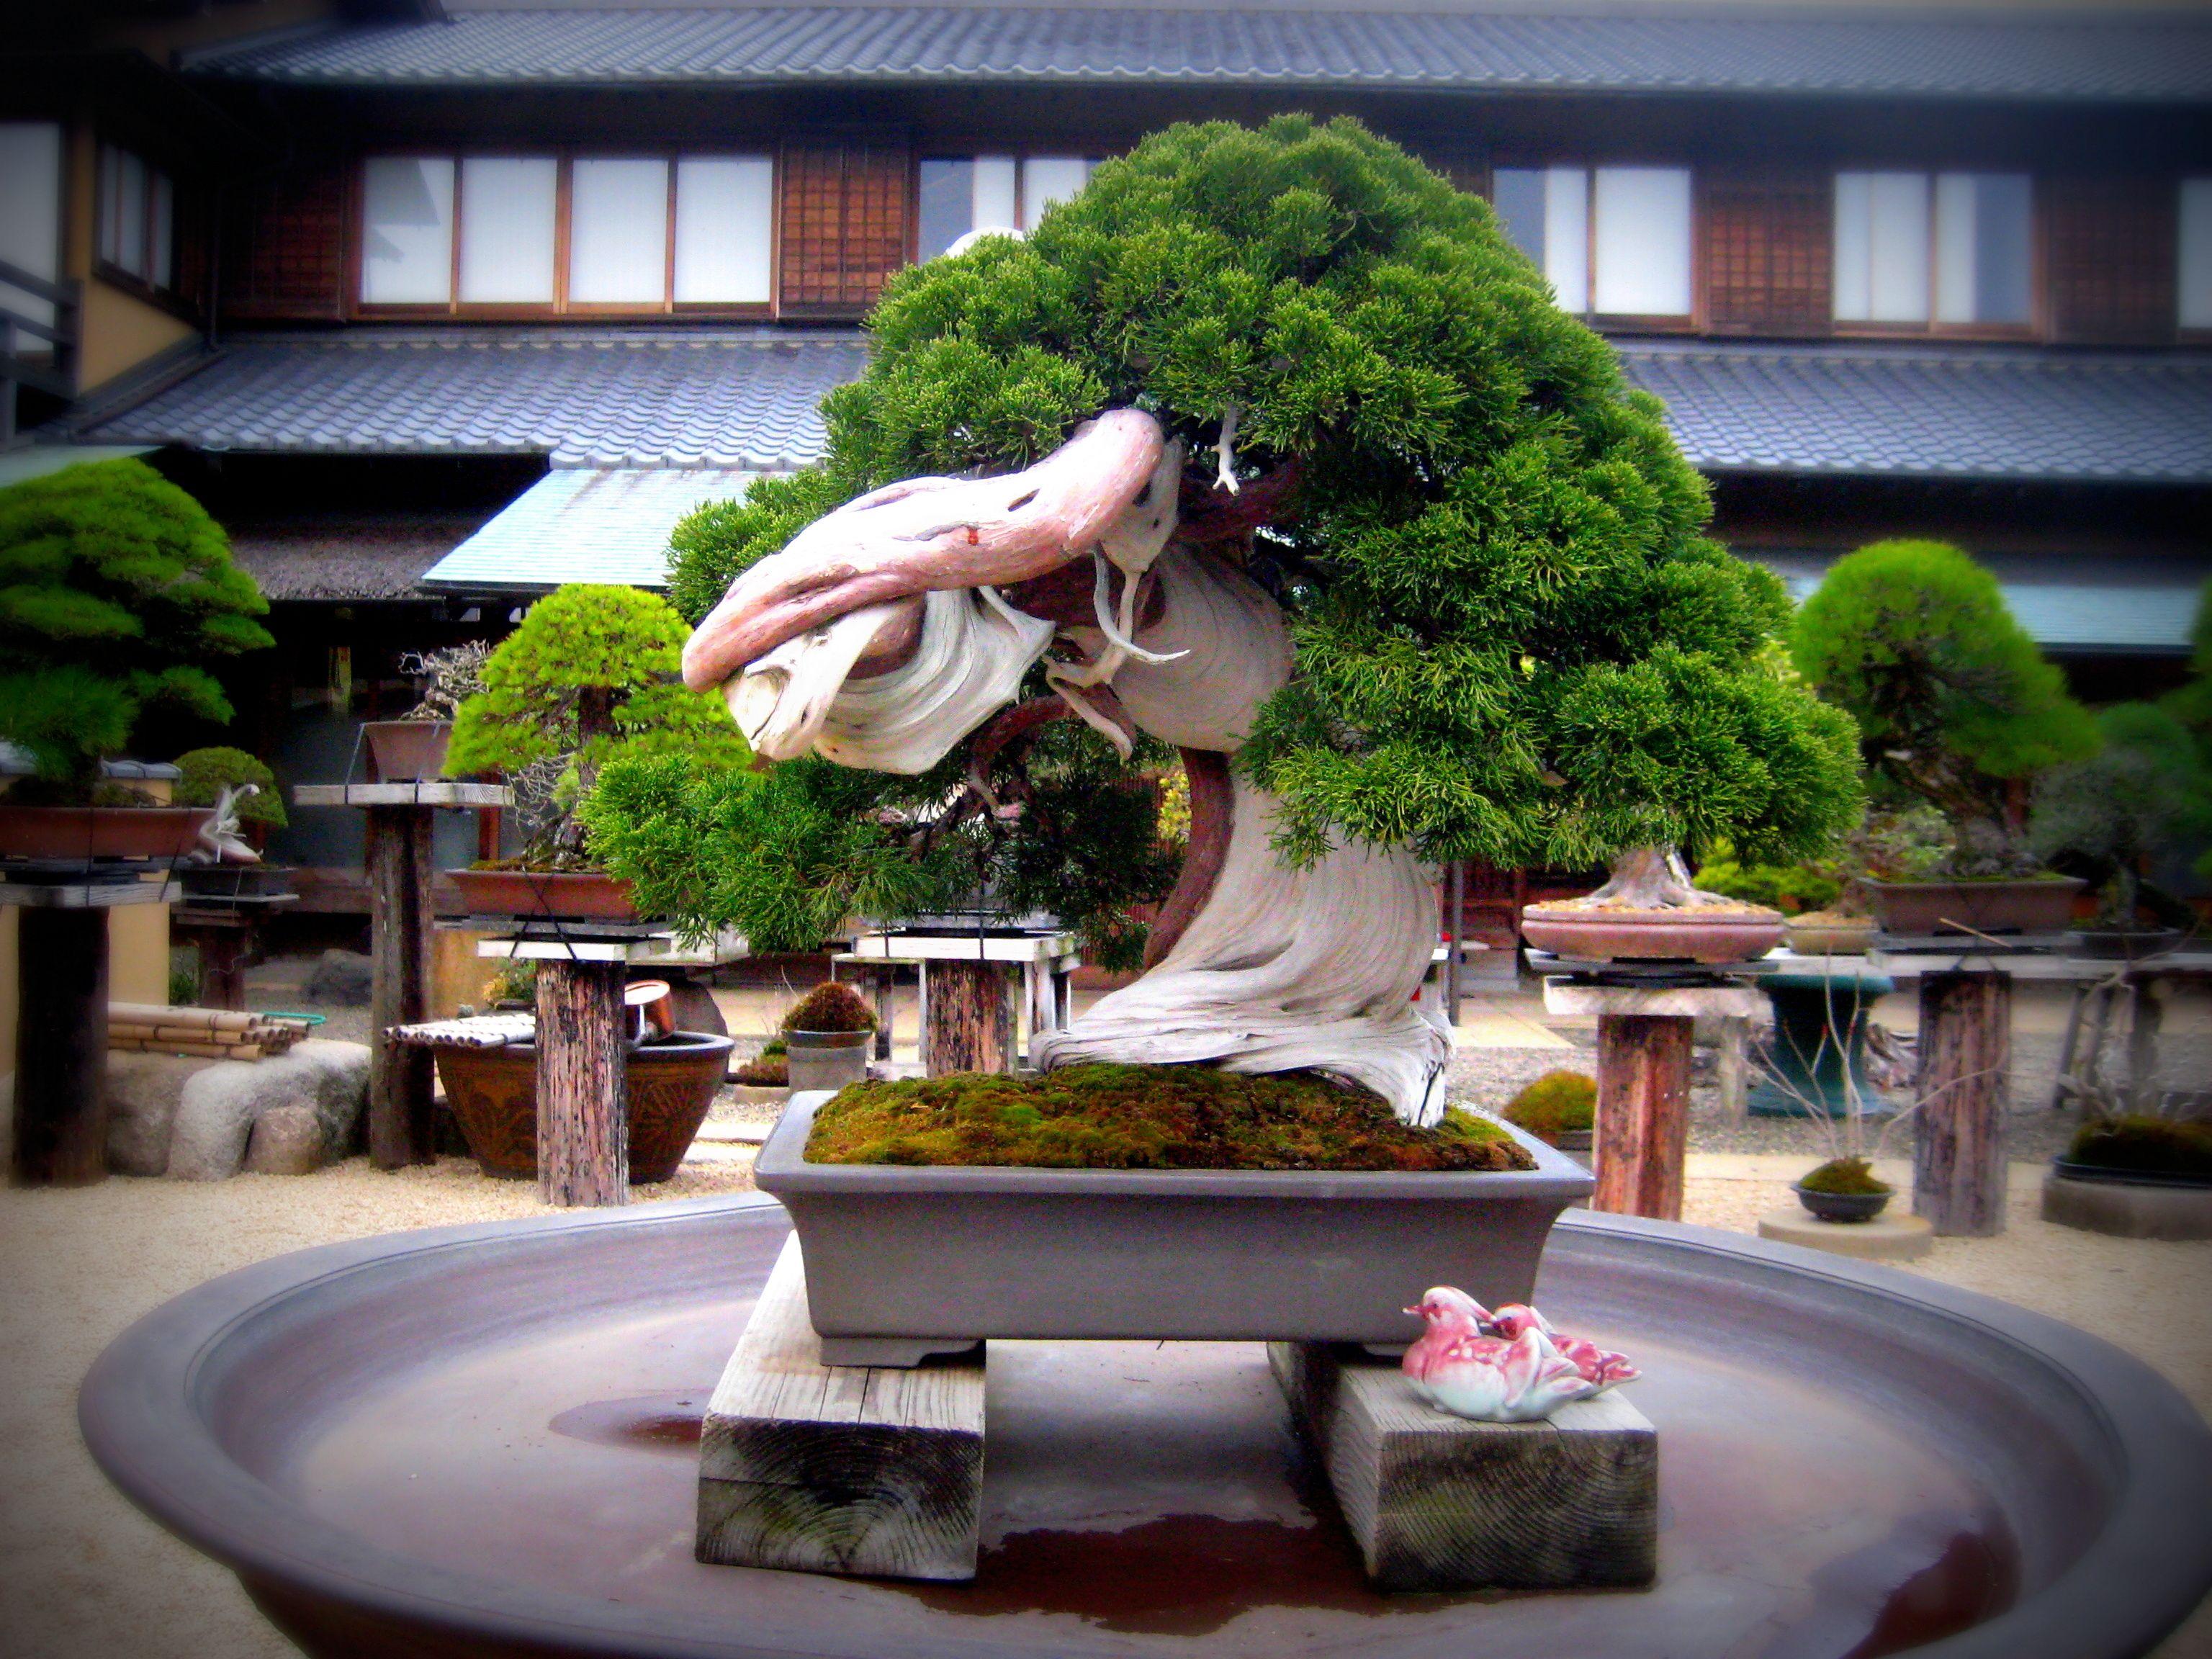 An 800 yearold Bonsai tree at Shunkaen, by sensei Kunio